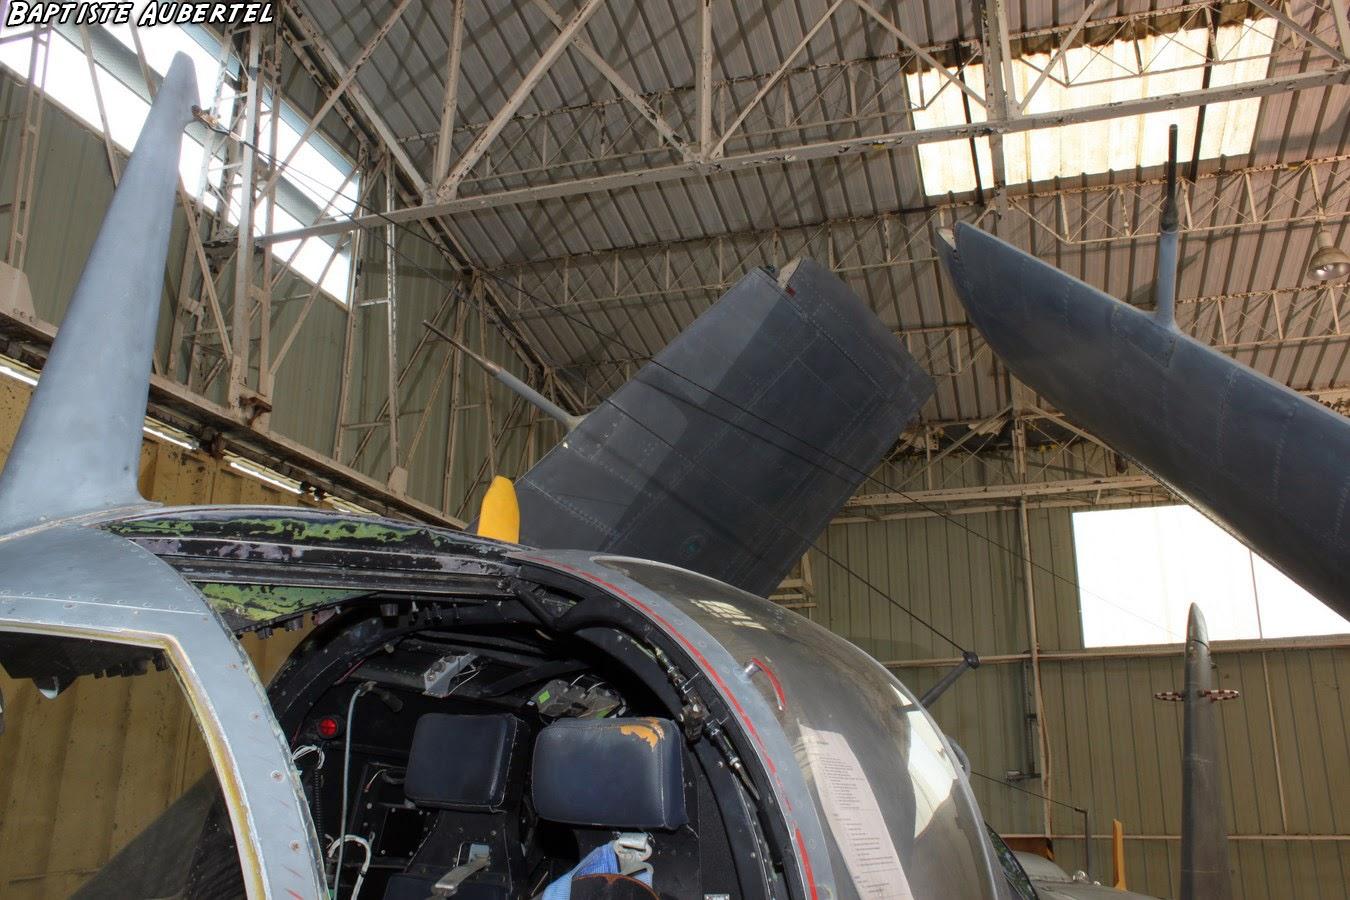 Musée Clément Ader EALC Corbas avions